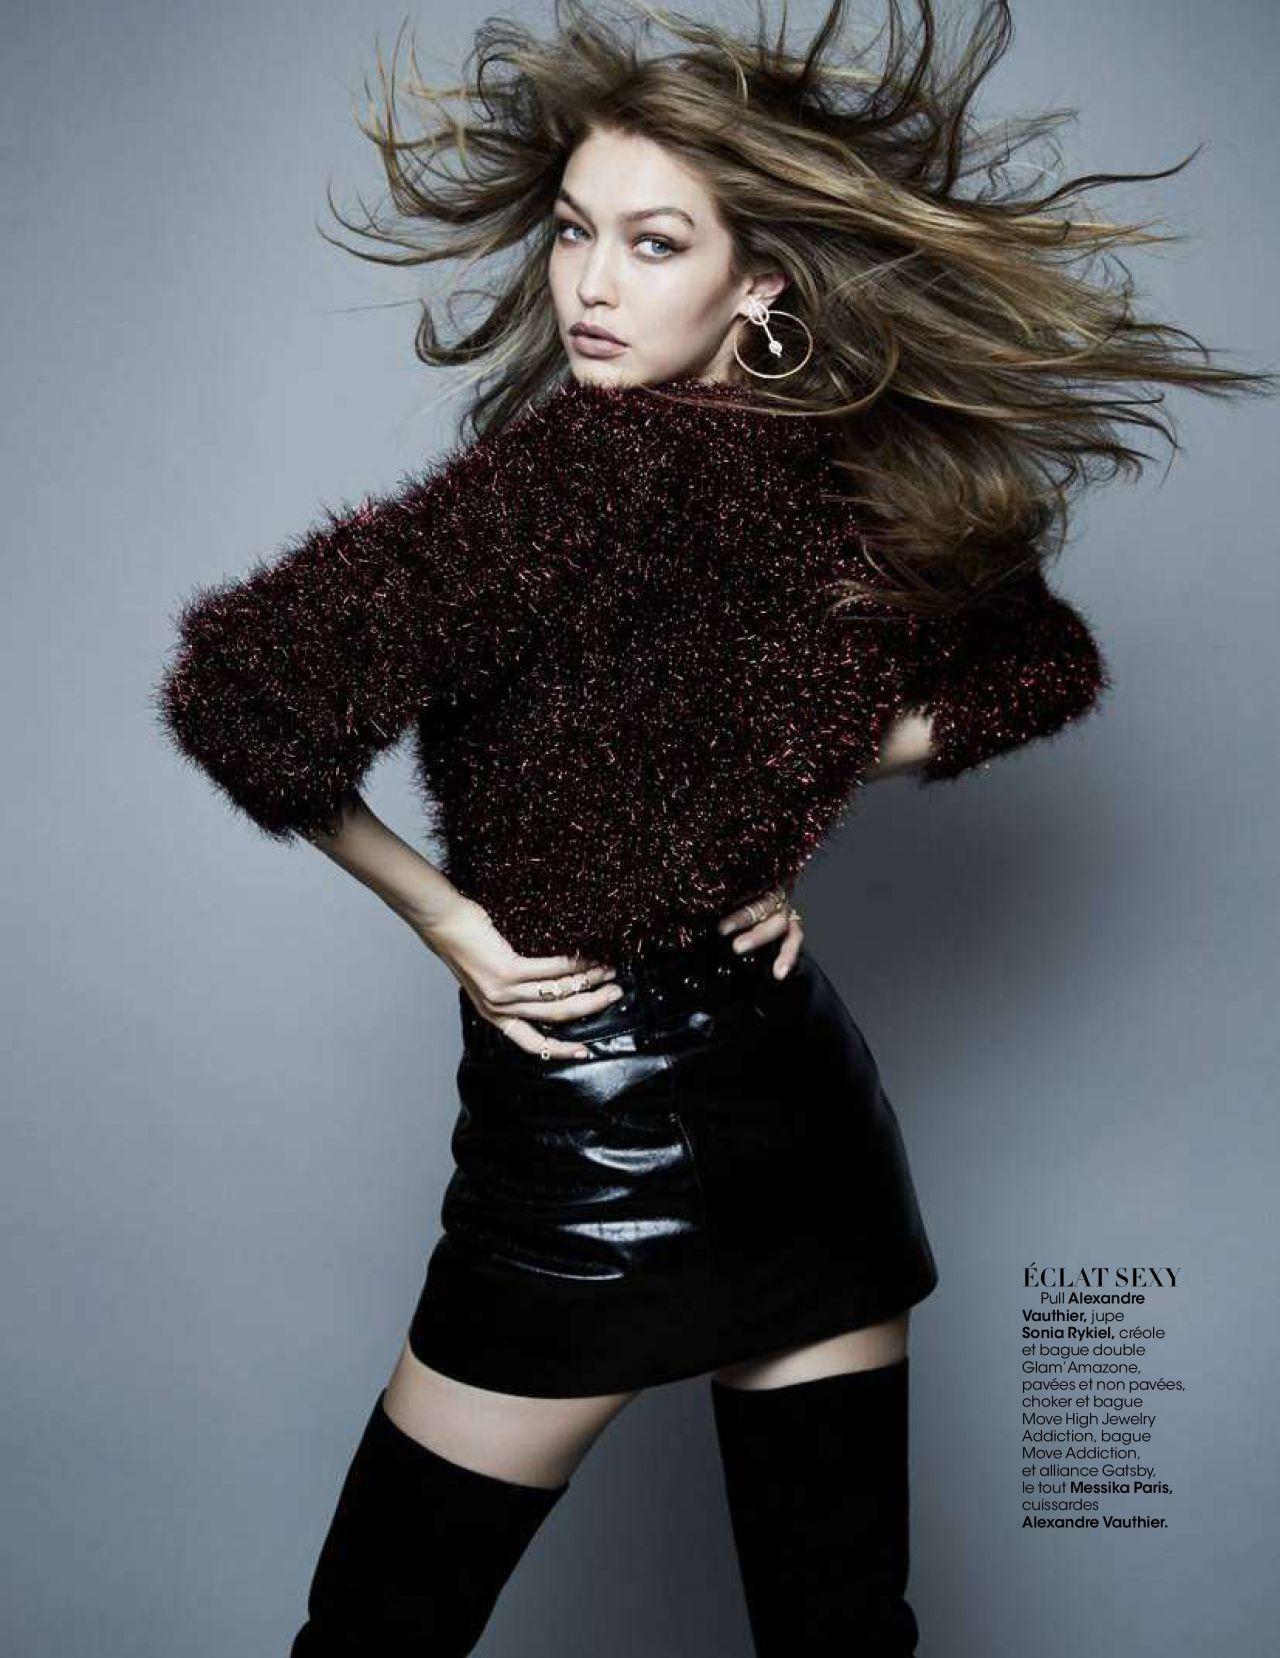 skirt sweater mini skirt black black skirt gigi hadid model editorial celebrity fall outfits